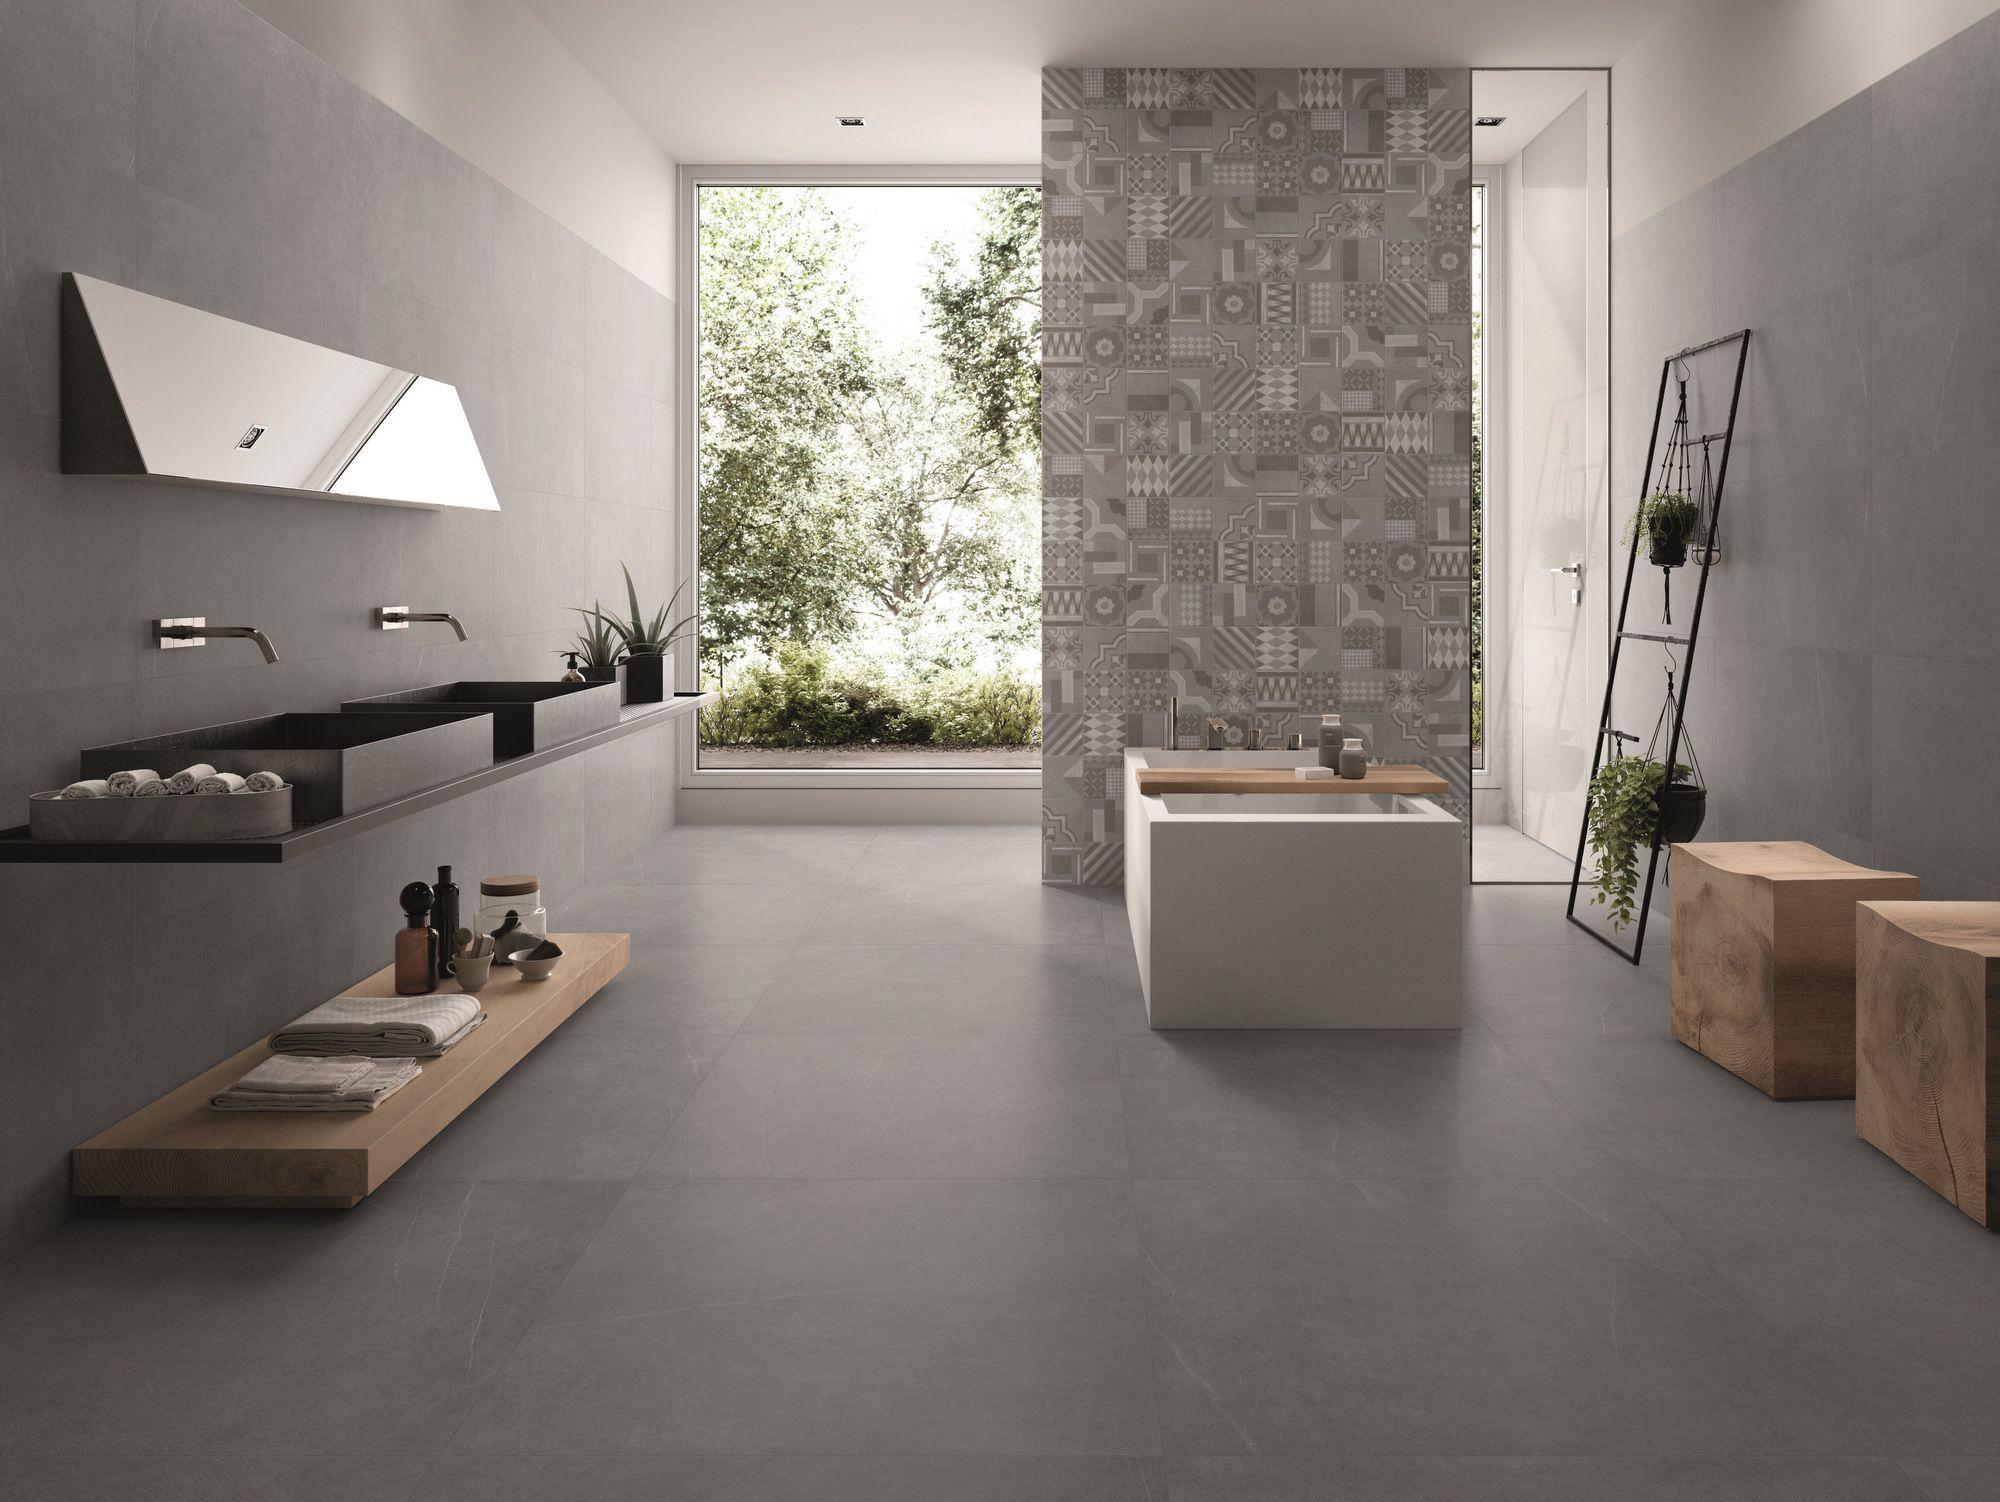 Pavimento in pietra piase piano sega antracite collezione - Suelos baratos para interior ...